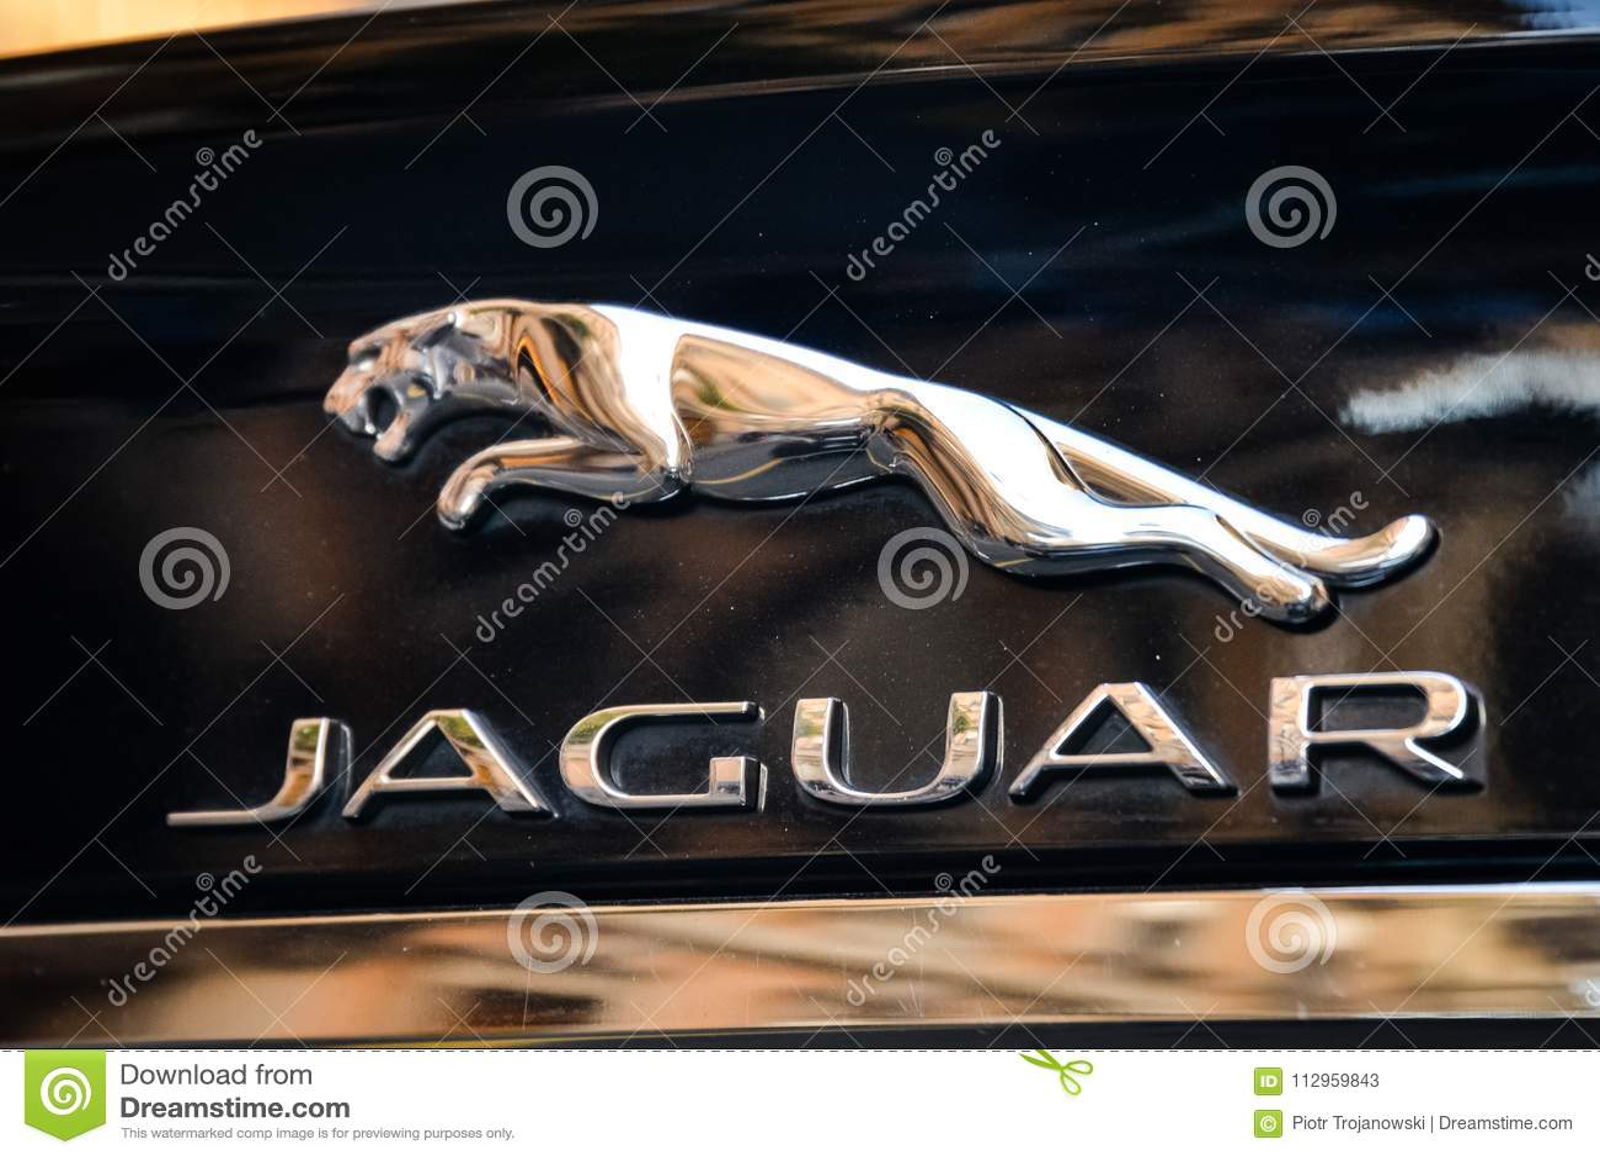 milan italy september 24 2017 jaguar logo on a black sport